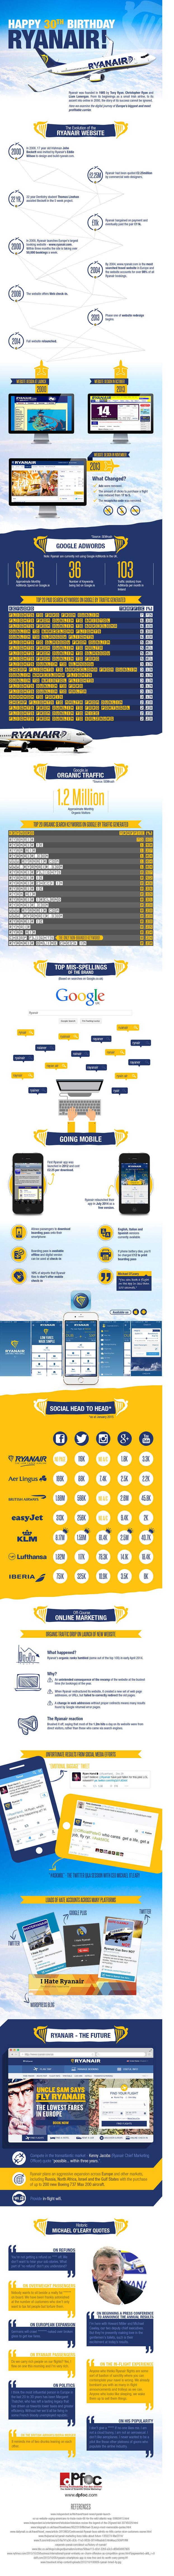 ryanair better customer experience infographic